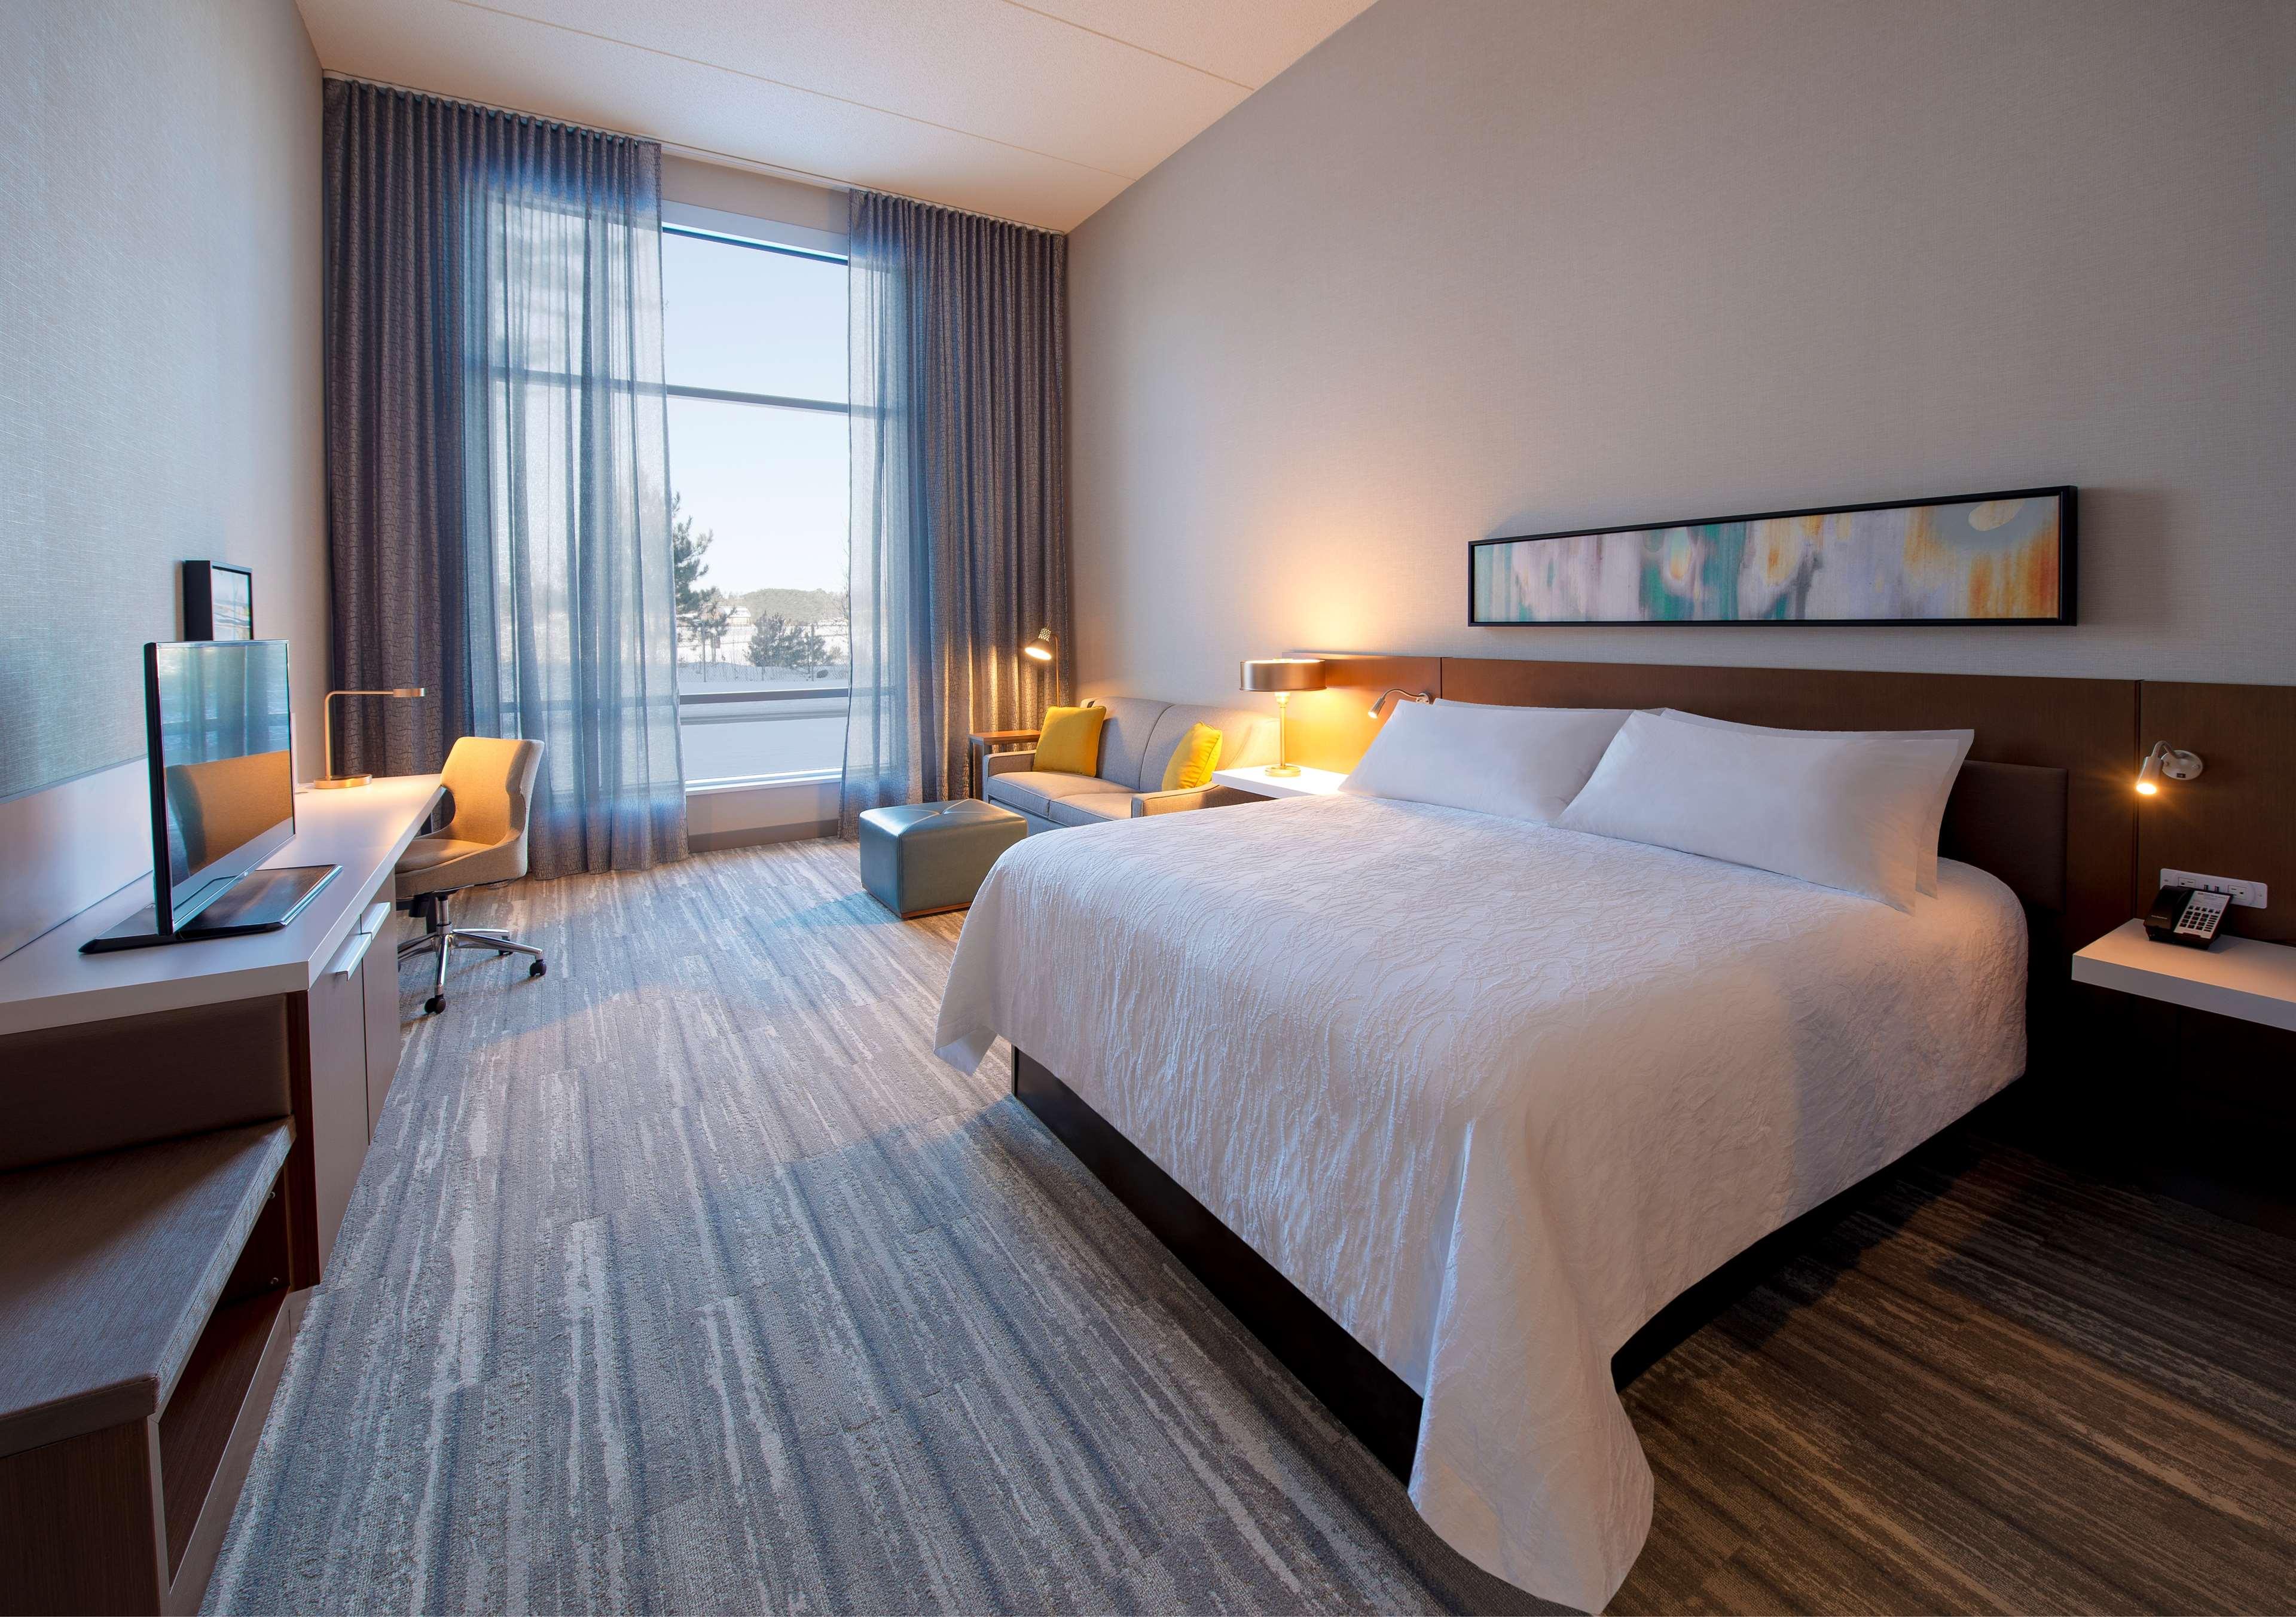 Hilton Garden Inn Wausau image 9